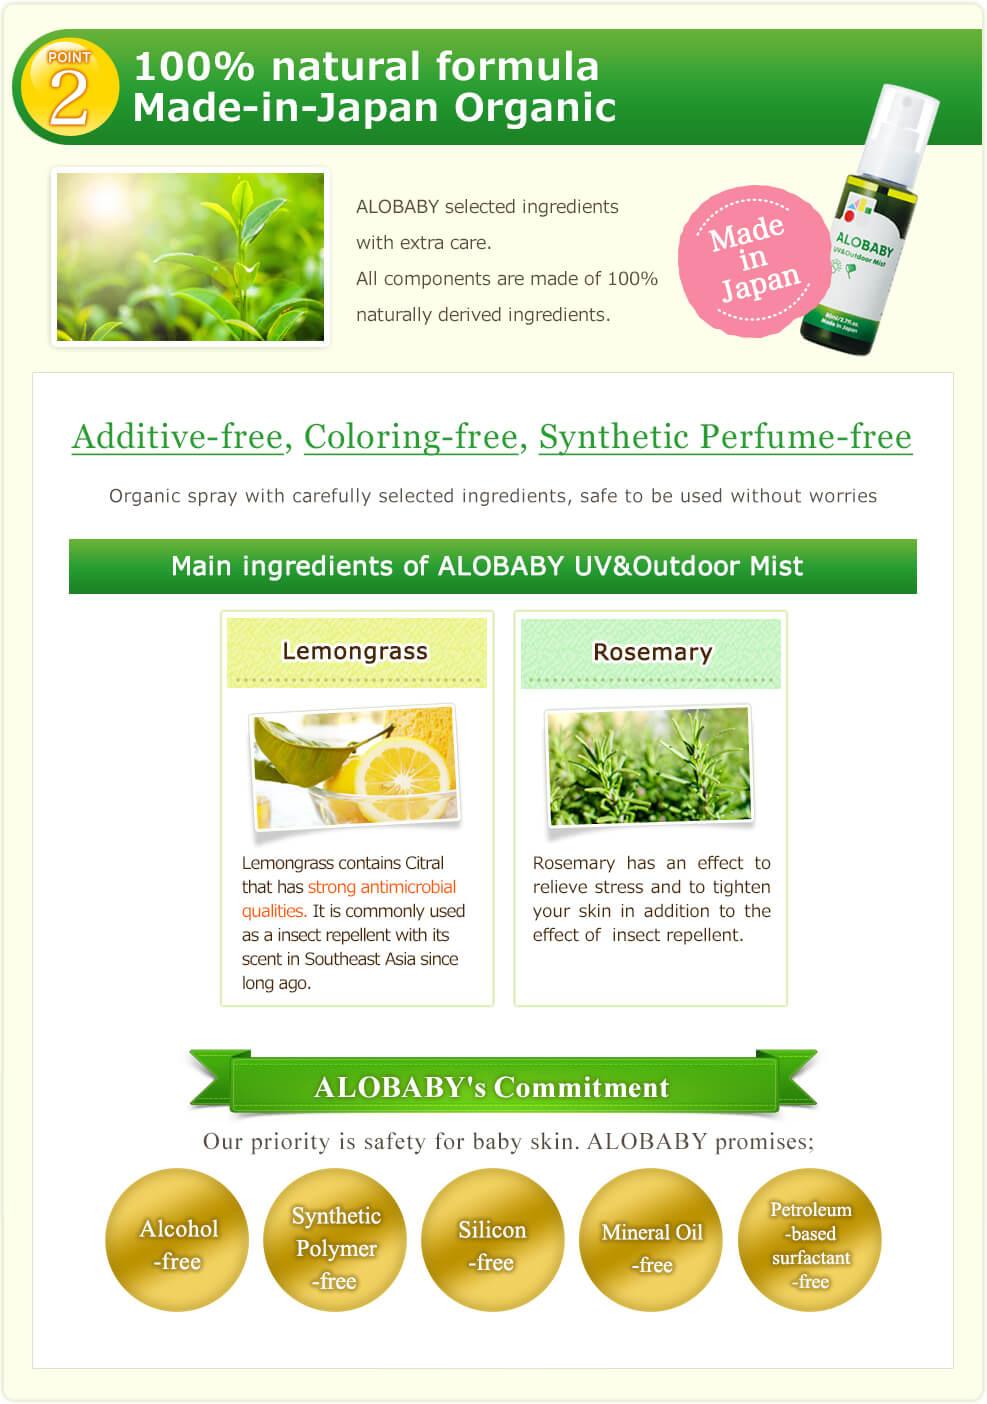 100% natural formula Made-in-Japan Organic